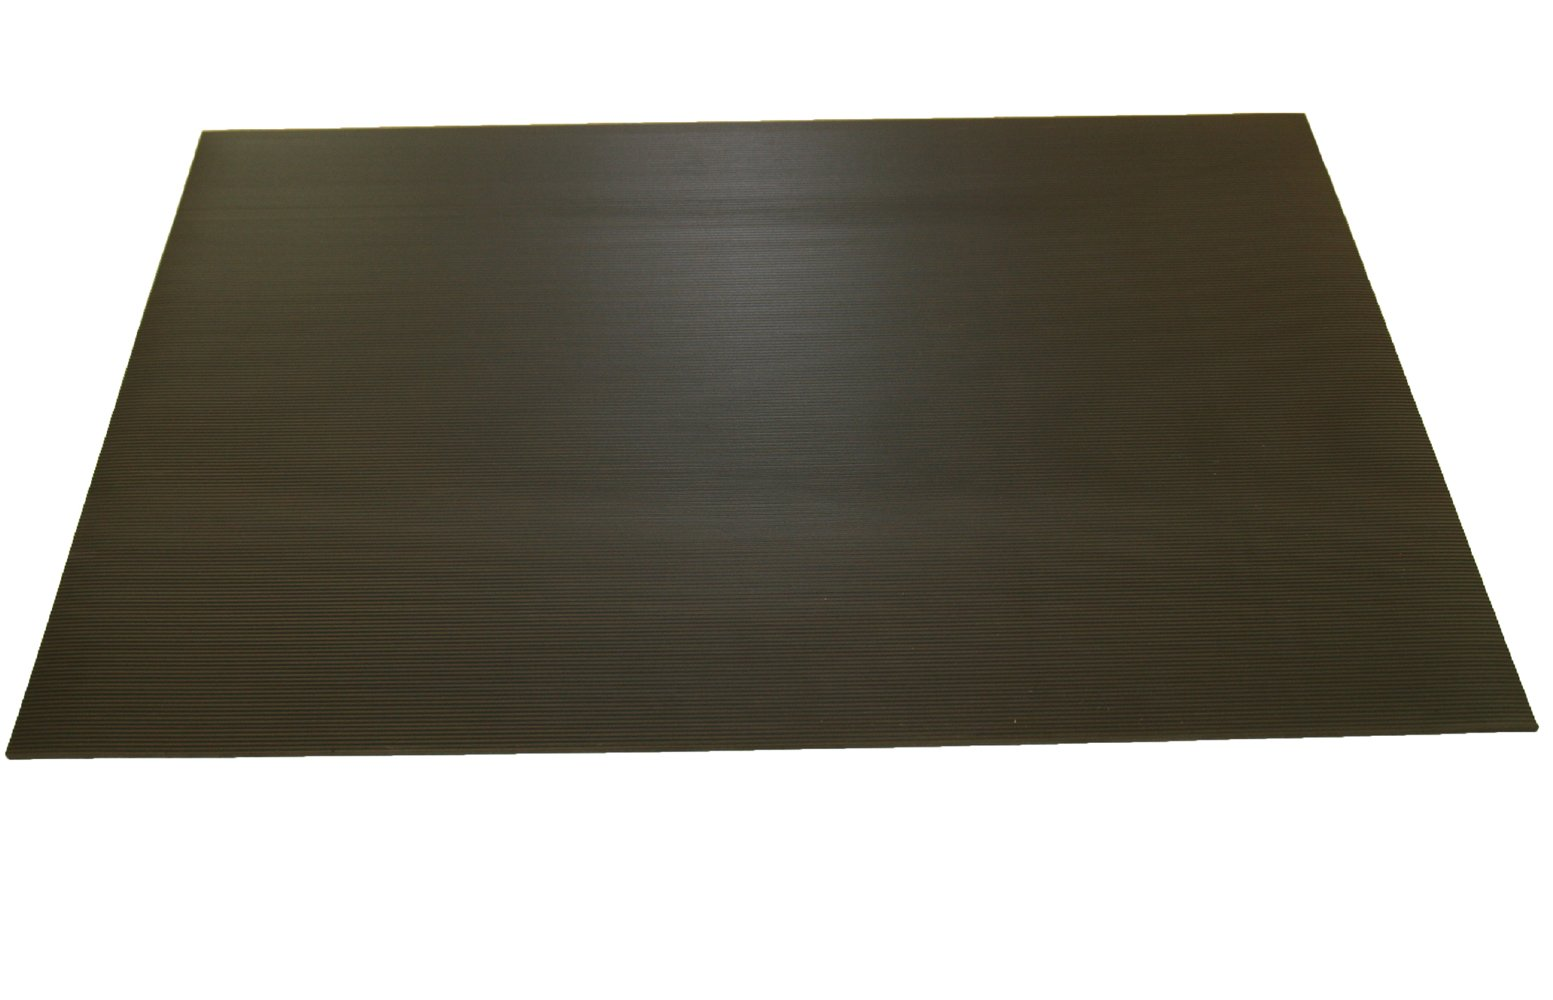 Rhino Mats DP-2436D Diamond Plate Pattern Dual Purpose Dielectric Anti-Fatigue Mat, 2' Width x 3' Length x 5/8'' Thickness, ASTM Type II Class 2, Black